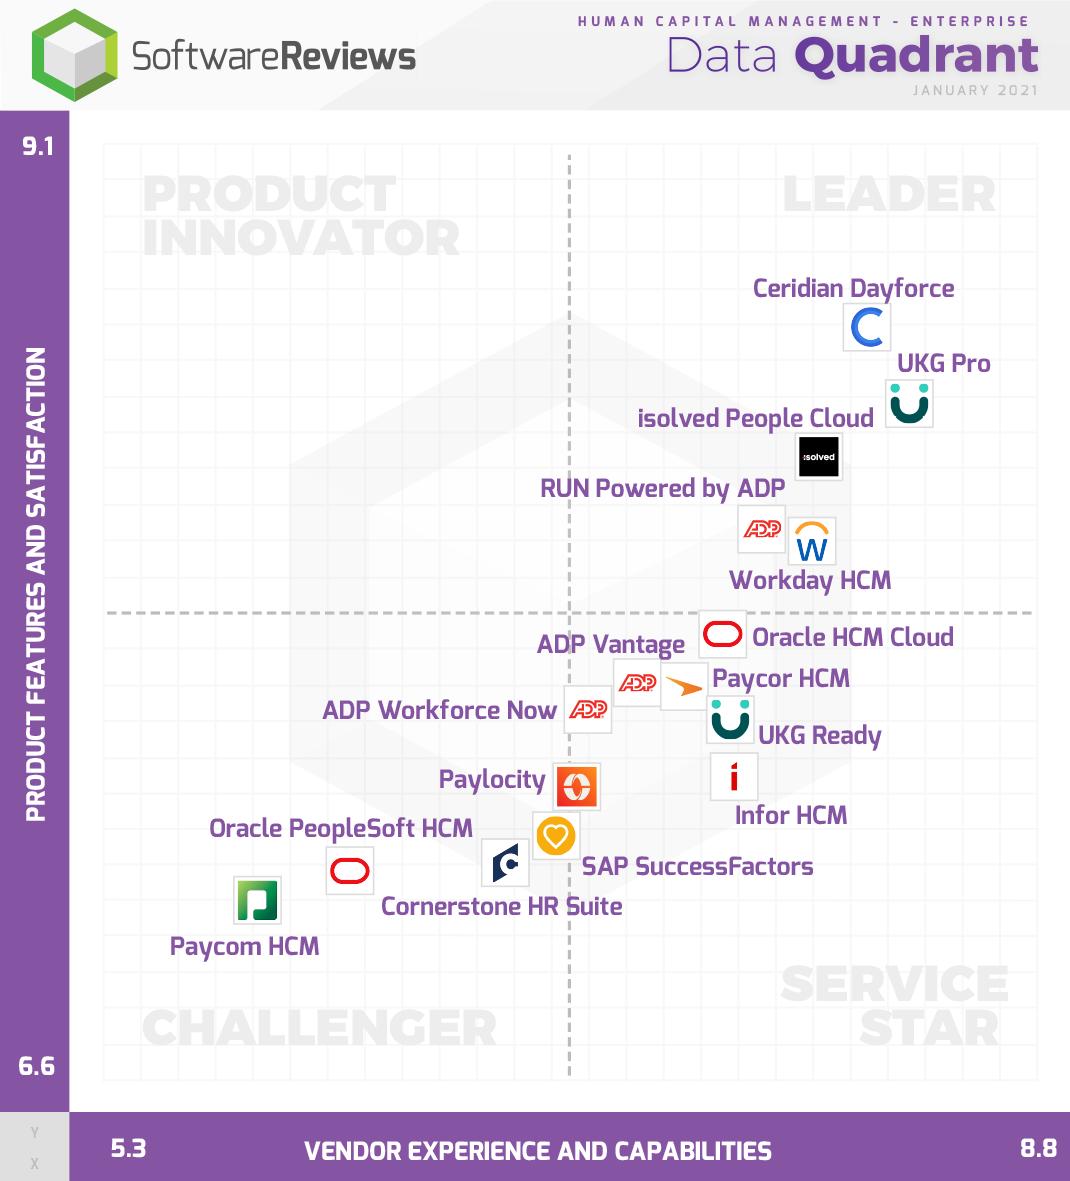 Human Capital Management - Enterprise Data Quadrant